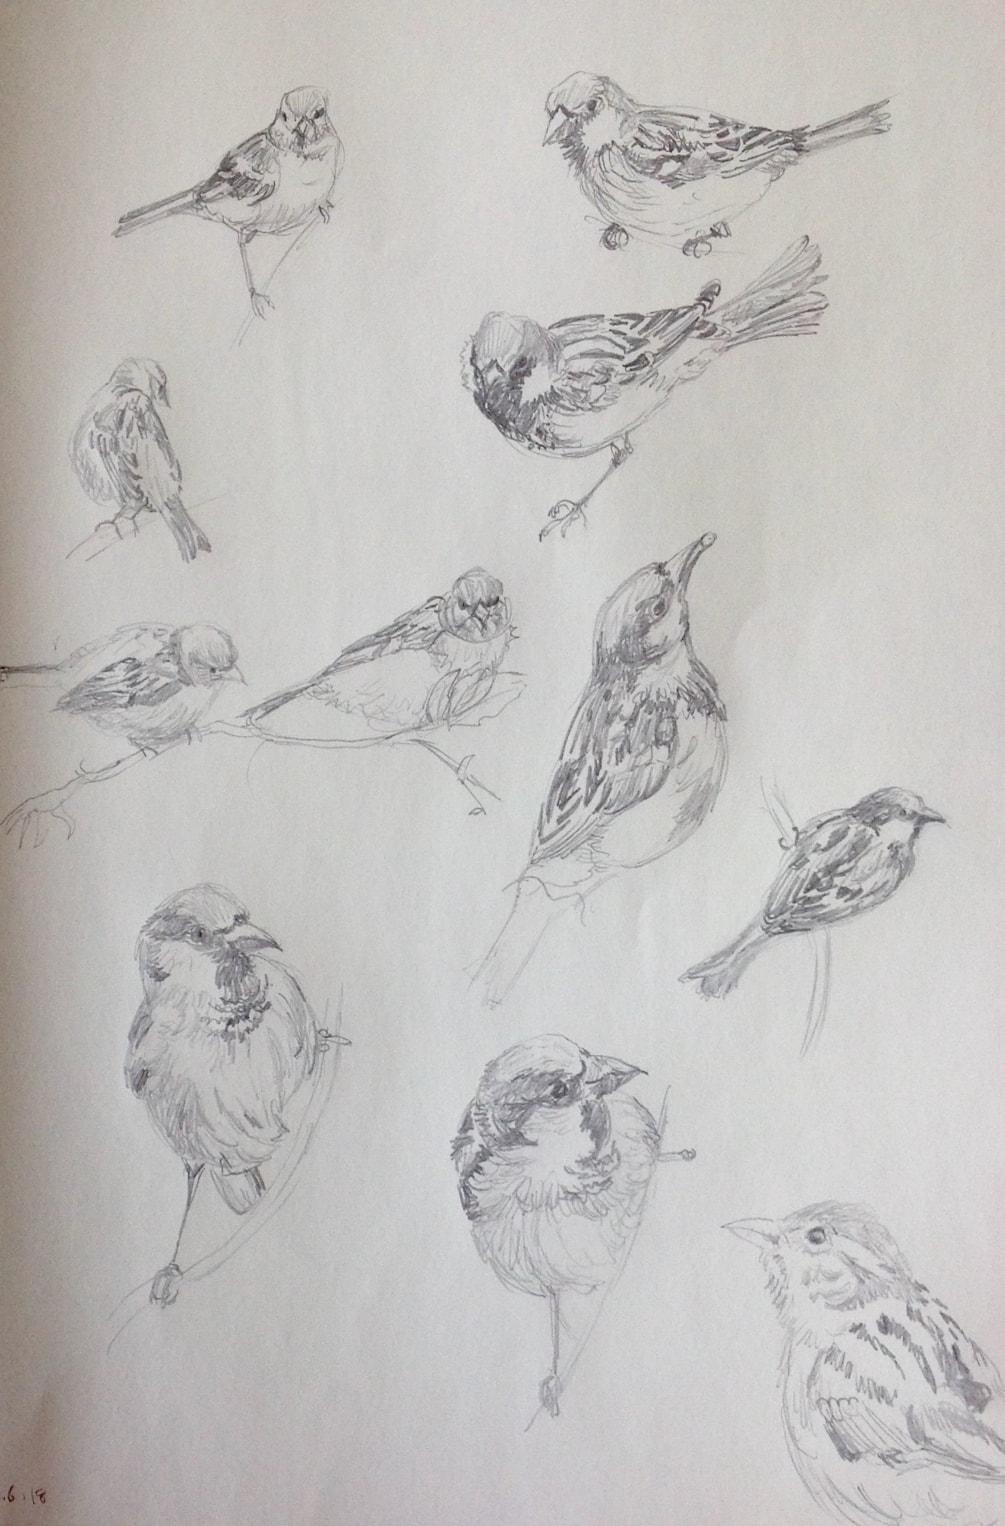 House sparrow sketches